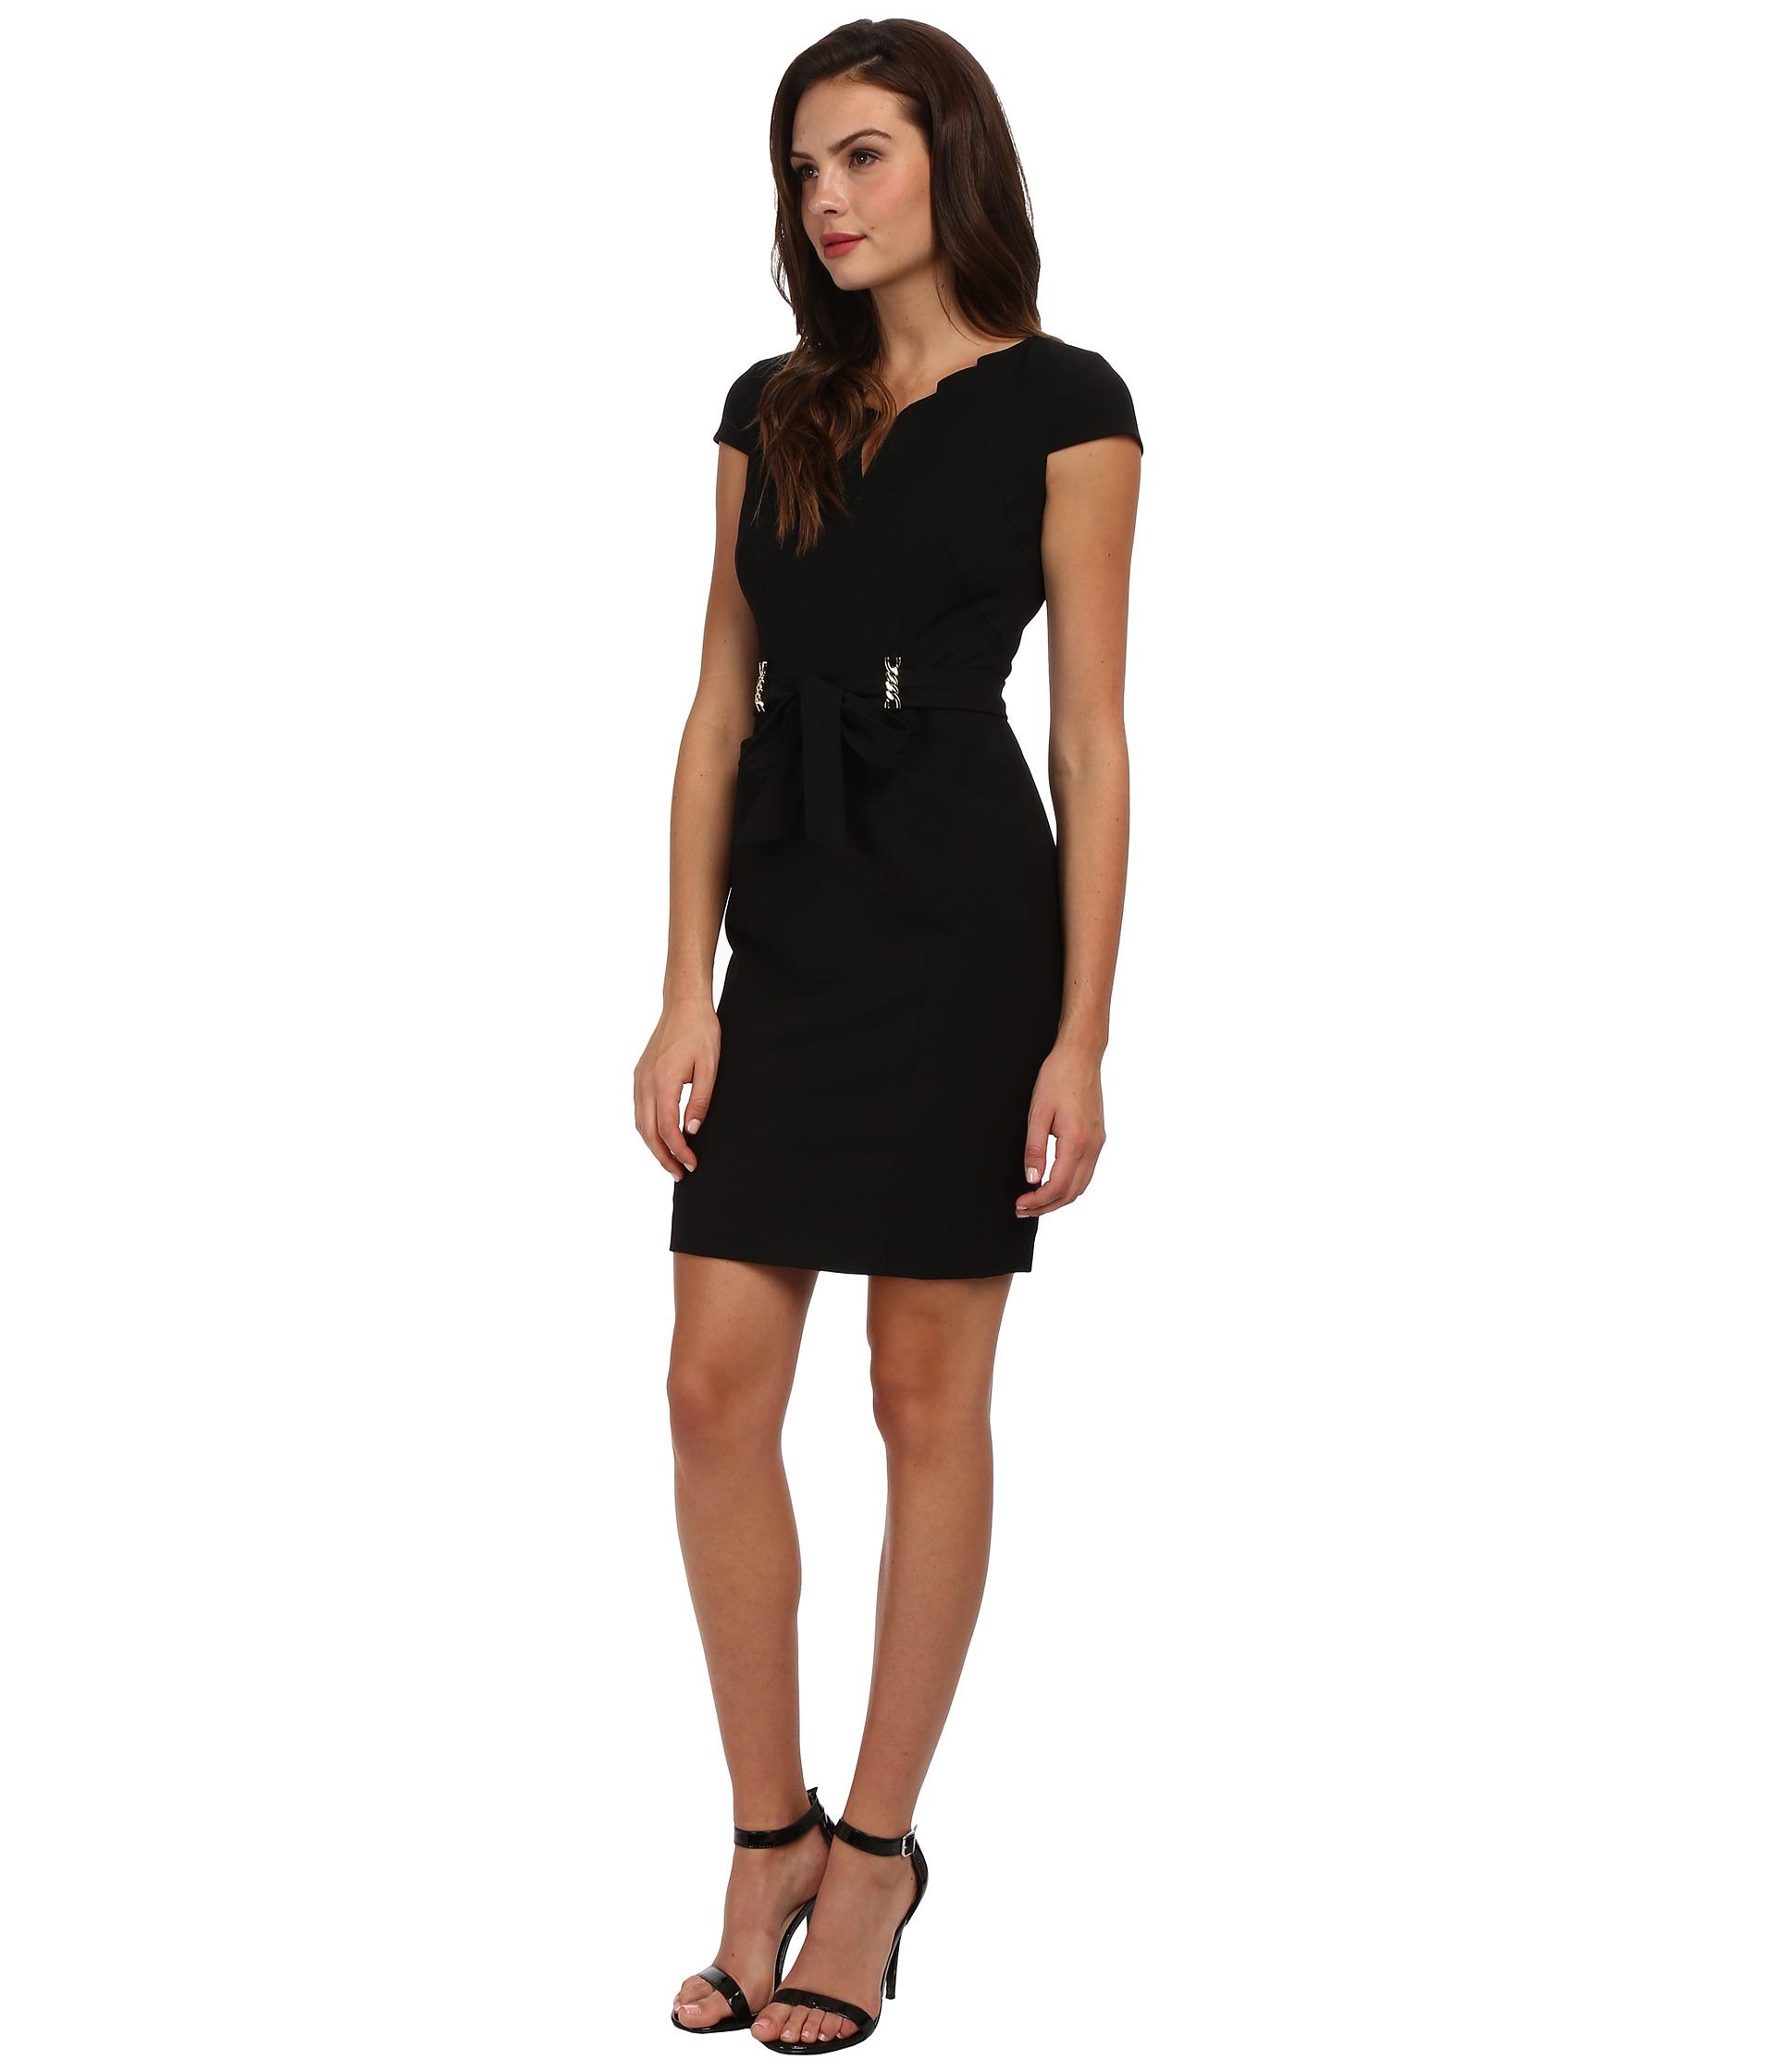 ellen tracy bistretch career dress with neck cutout in black lyst. Black Bedroom Furniture Sets. Home Design Ideas